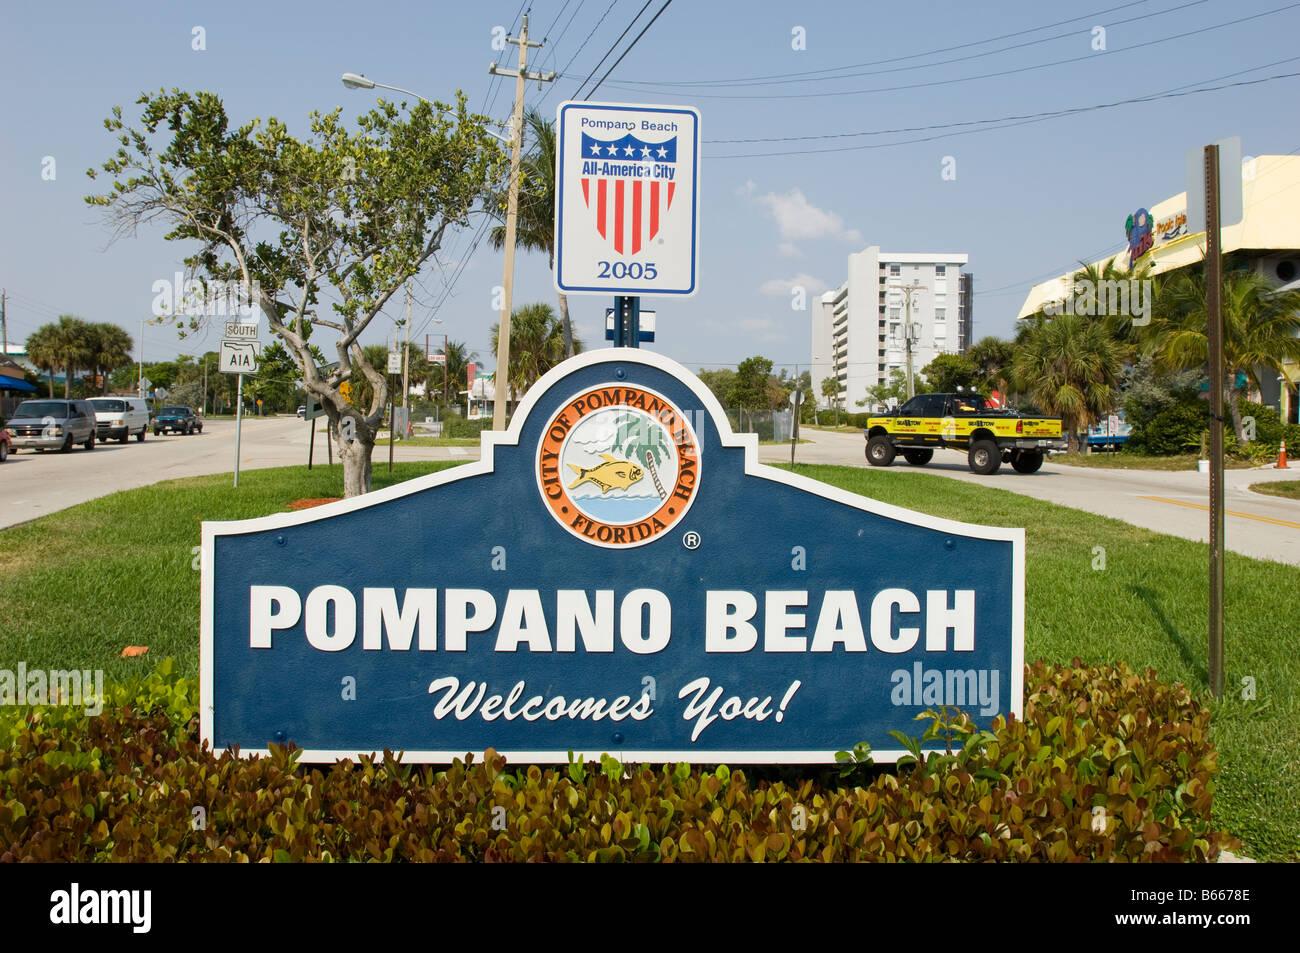 Pompano Beach Gold Coast Florida United States of America - Stock Image